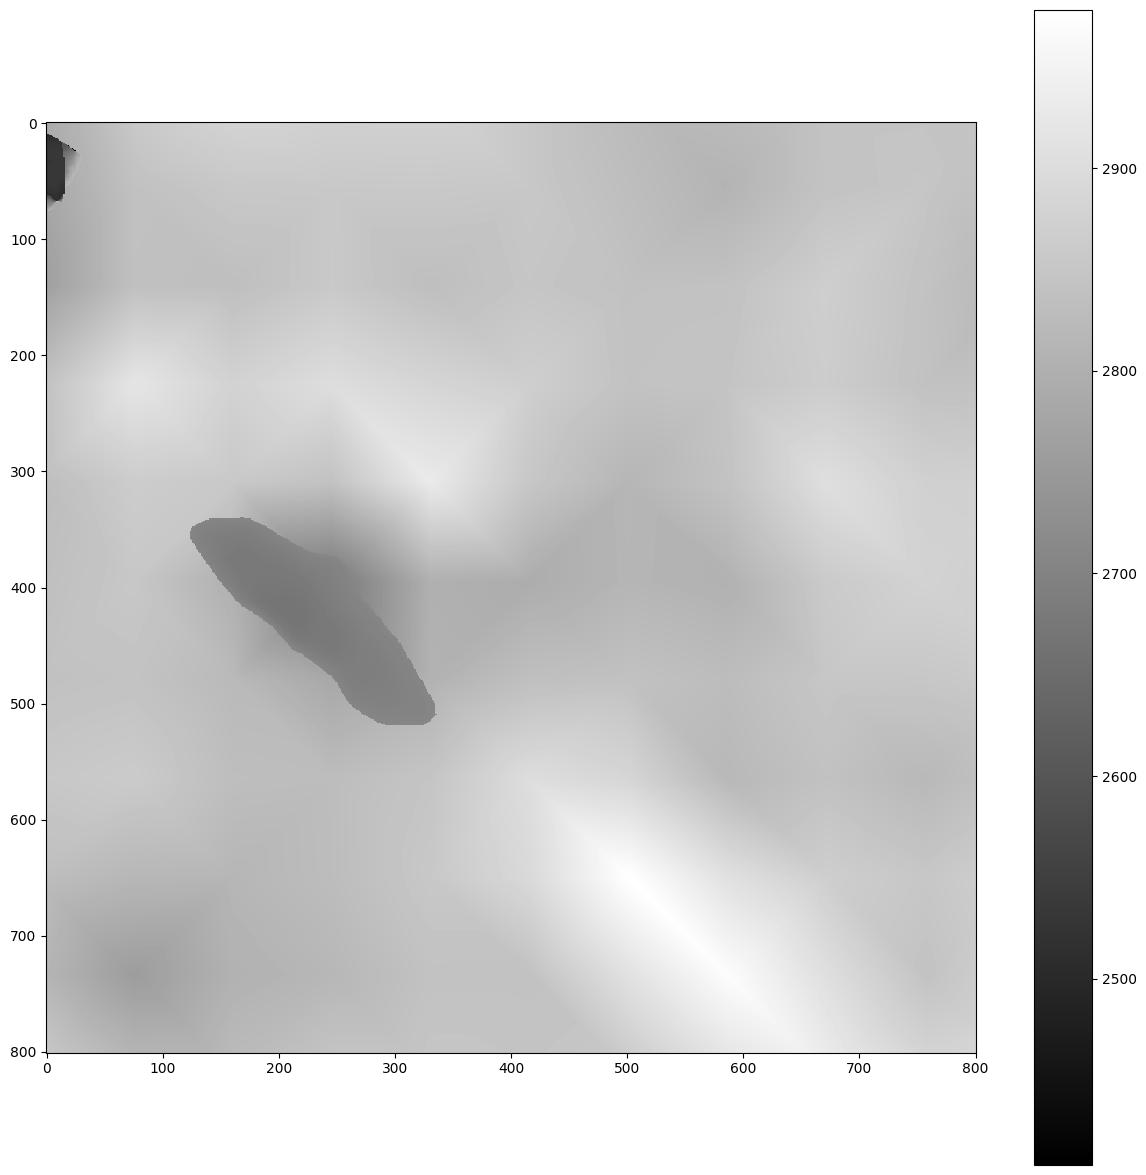 bench/seismic/wp/la_habra/meshes/velocity_model/plots/rho_7500.png